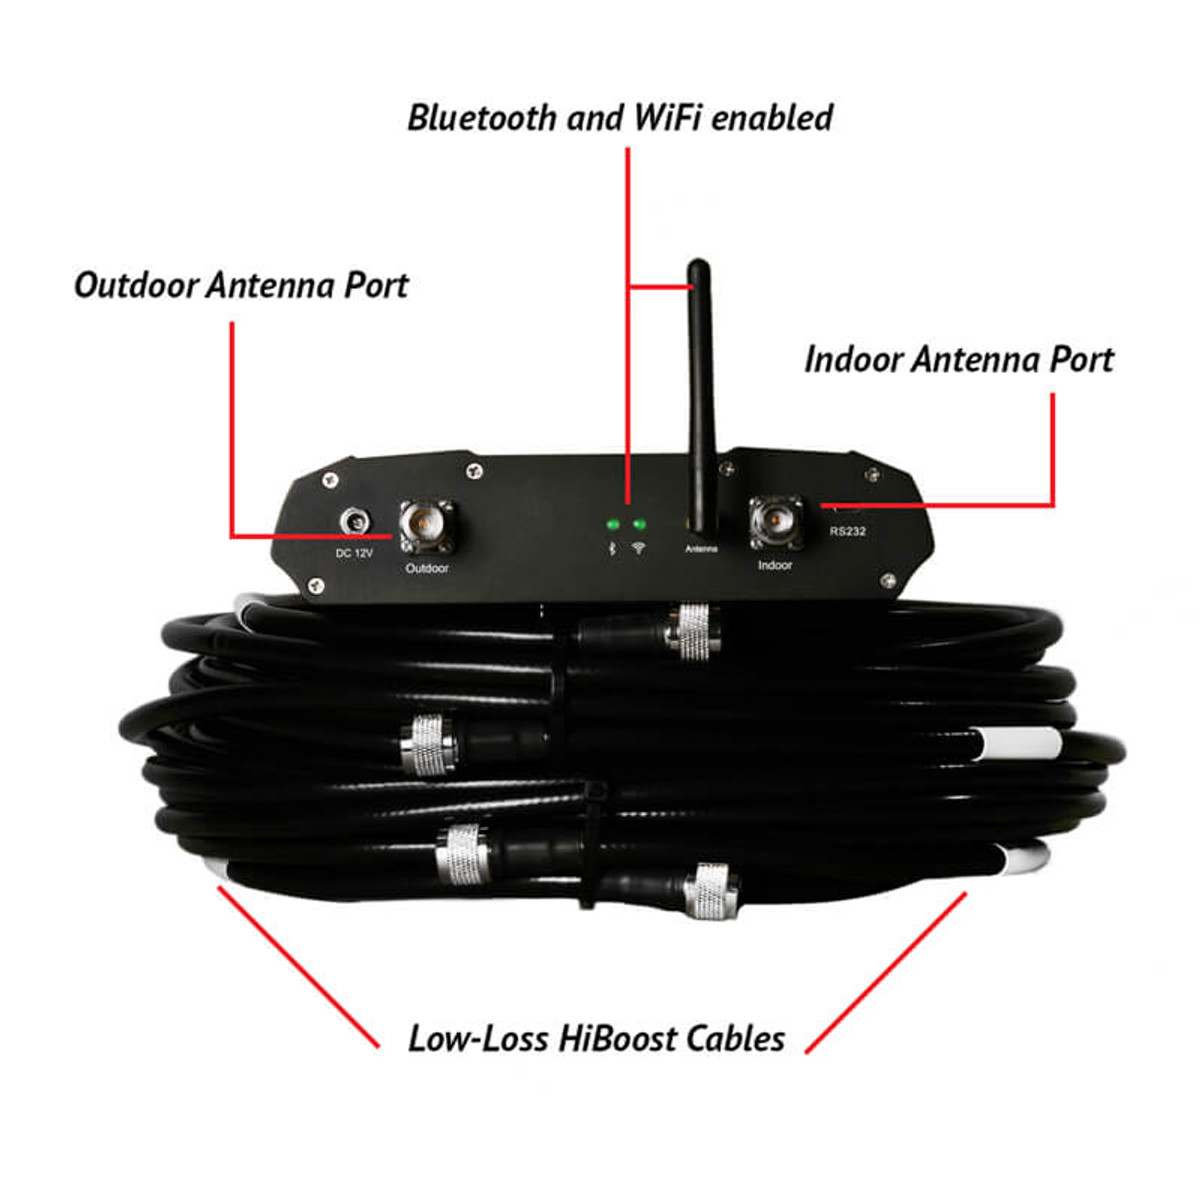 HiBoost Home 15K Smart Link Signal Booster Amplifier Rear